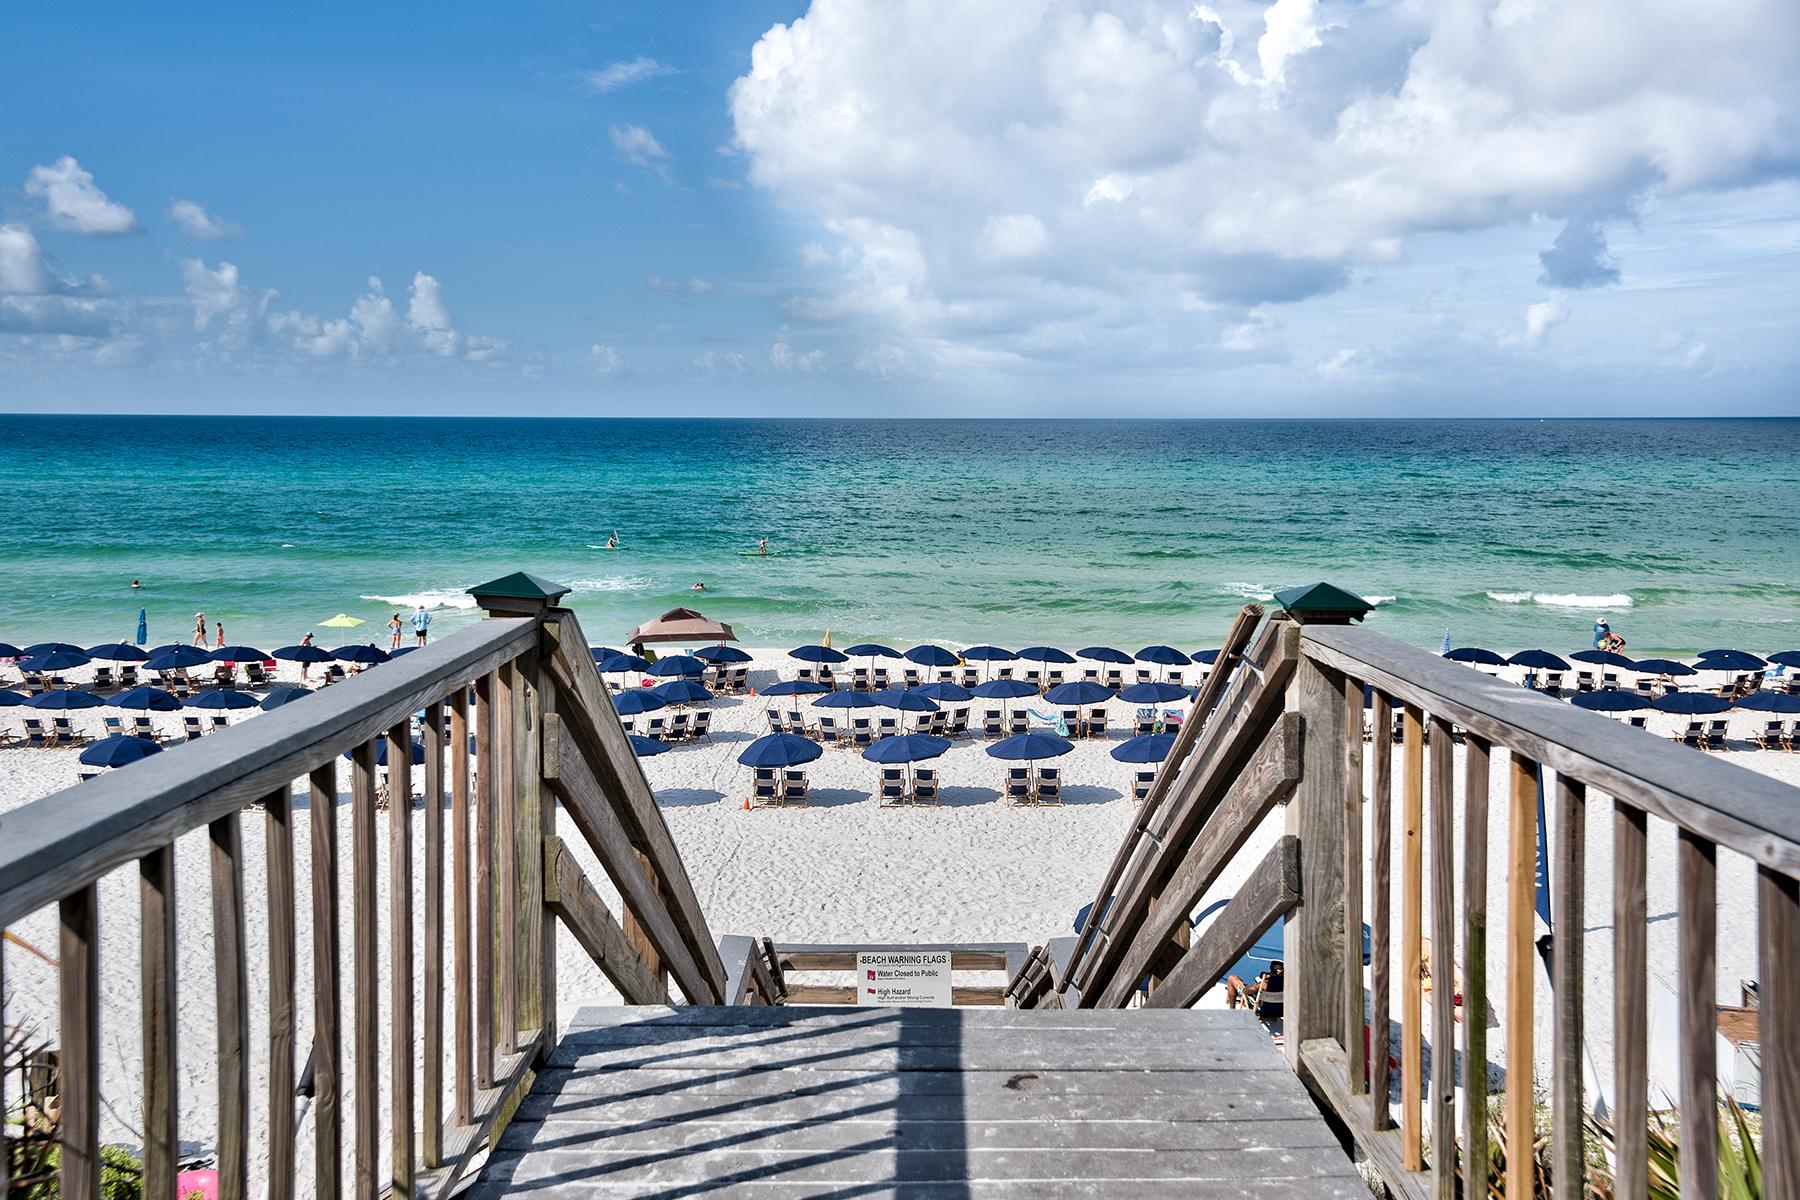 Seacrest Beach Access | Scenic Sotheby's International Realty - Where Is Seacrest Beach Florida On The Map